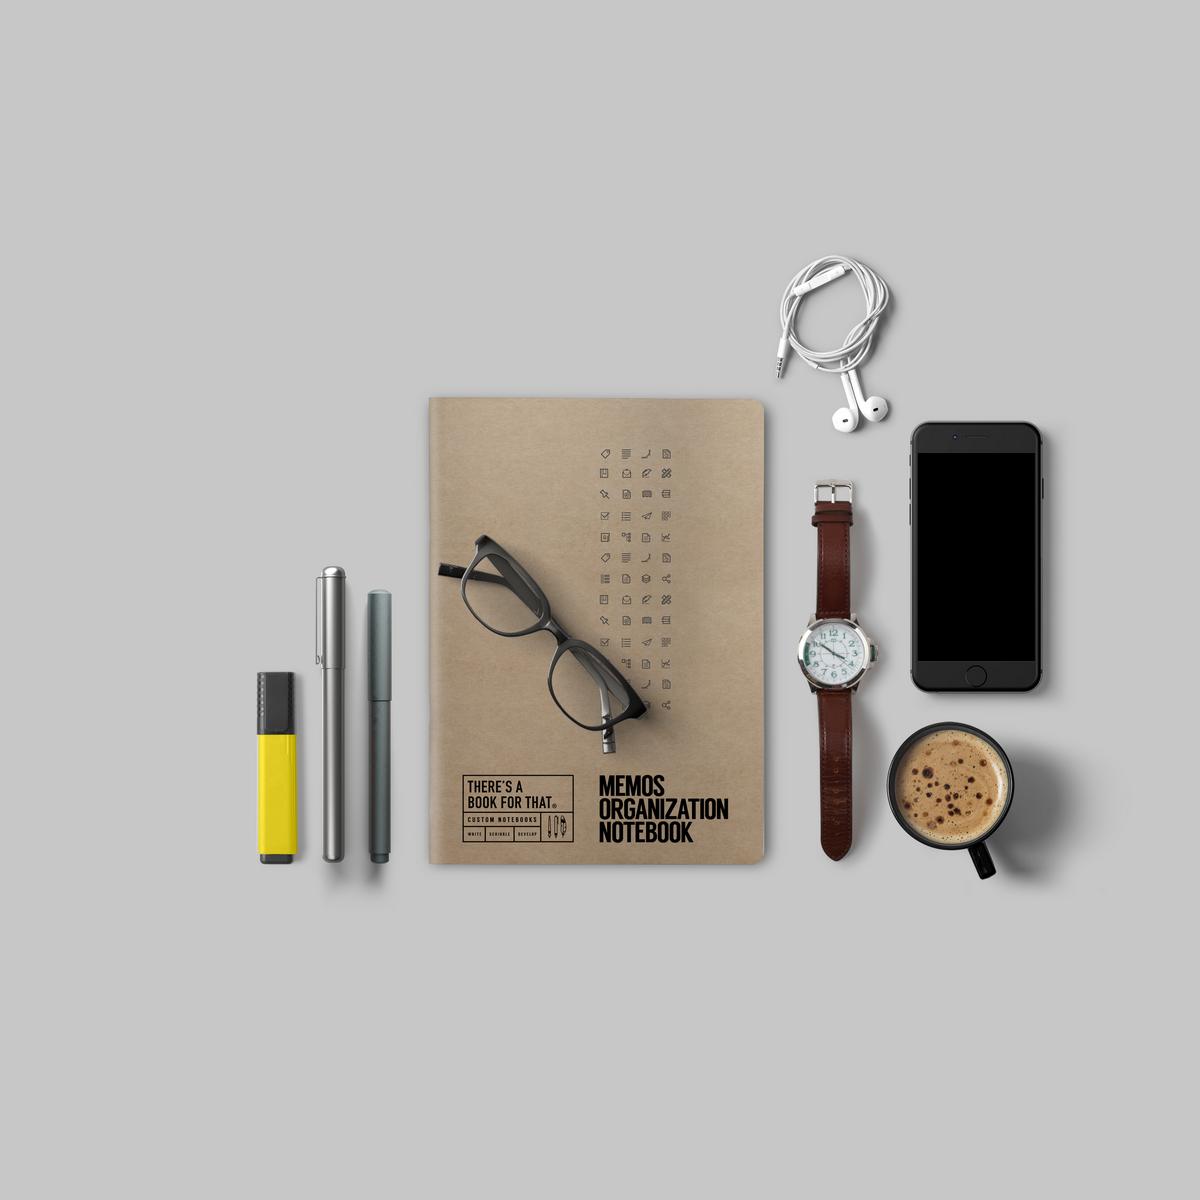 B-104_Memos-Organization-Notebook_Stationery_Lifestyle